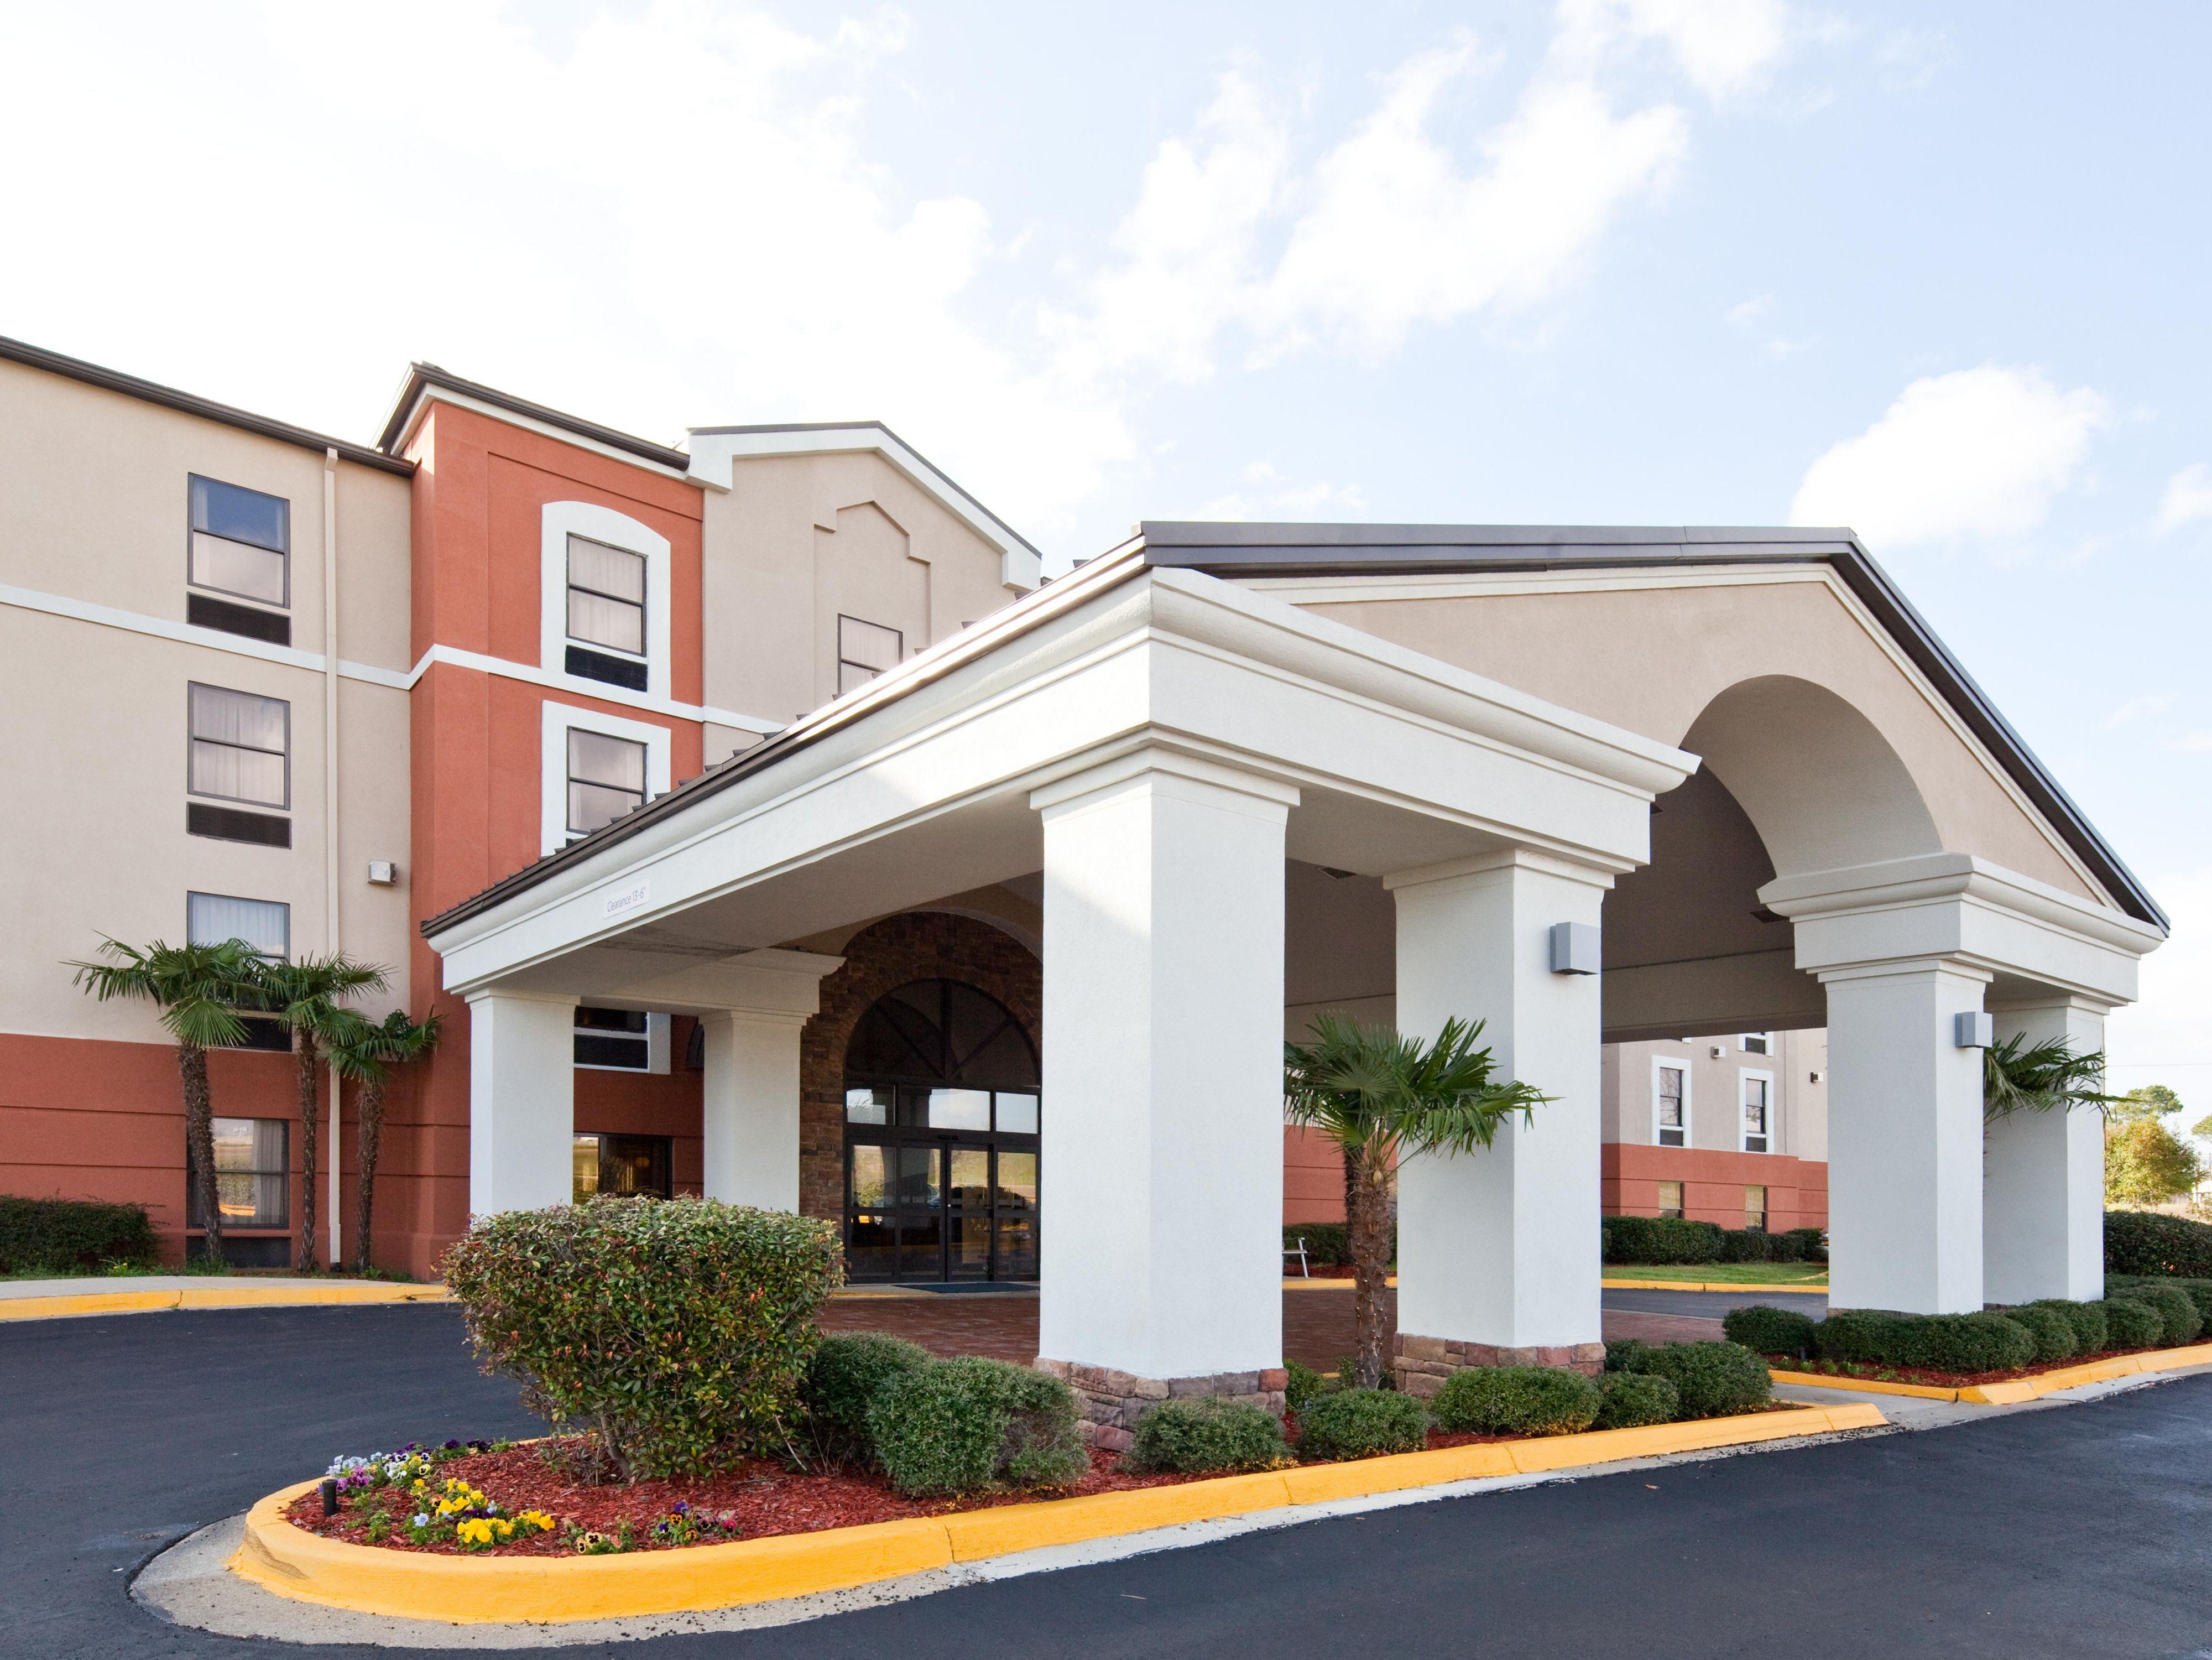 Hotels in ridgeland mississippi holiday inn express ihg reheart Gallery